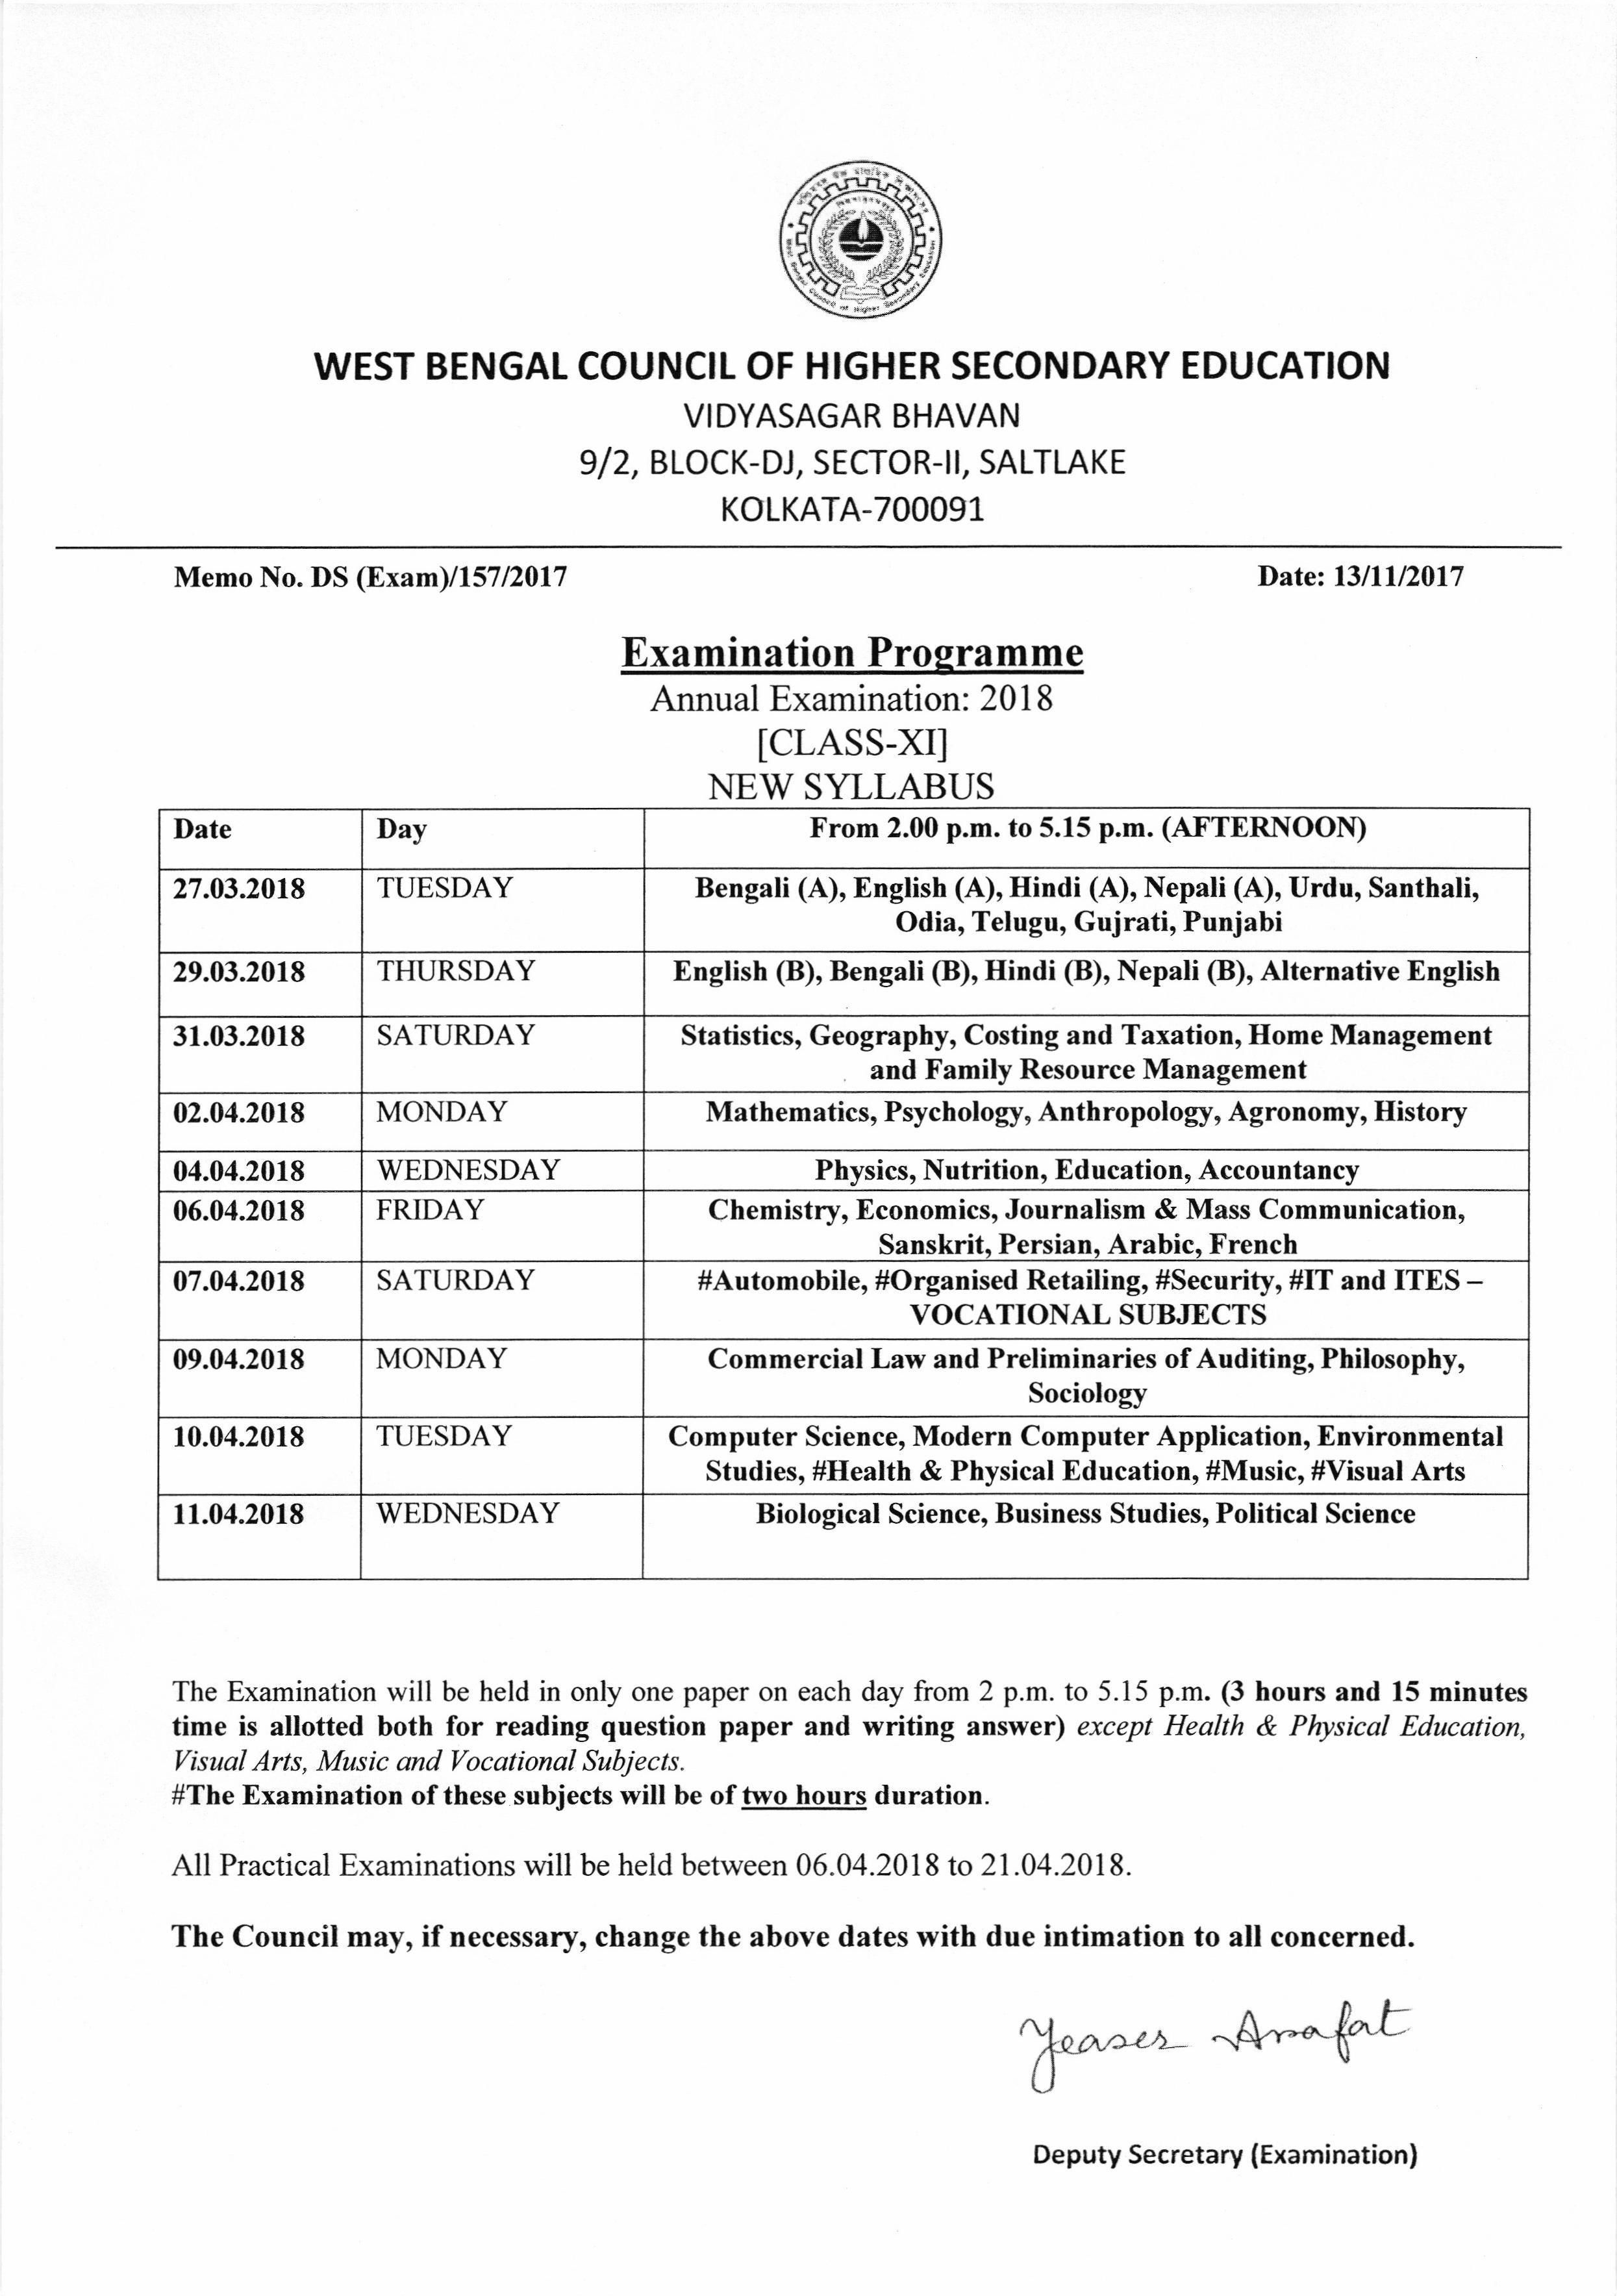 Image: Annual Examination Routine 2018 for Class XI (New Syllabus)